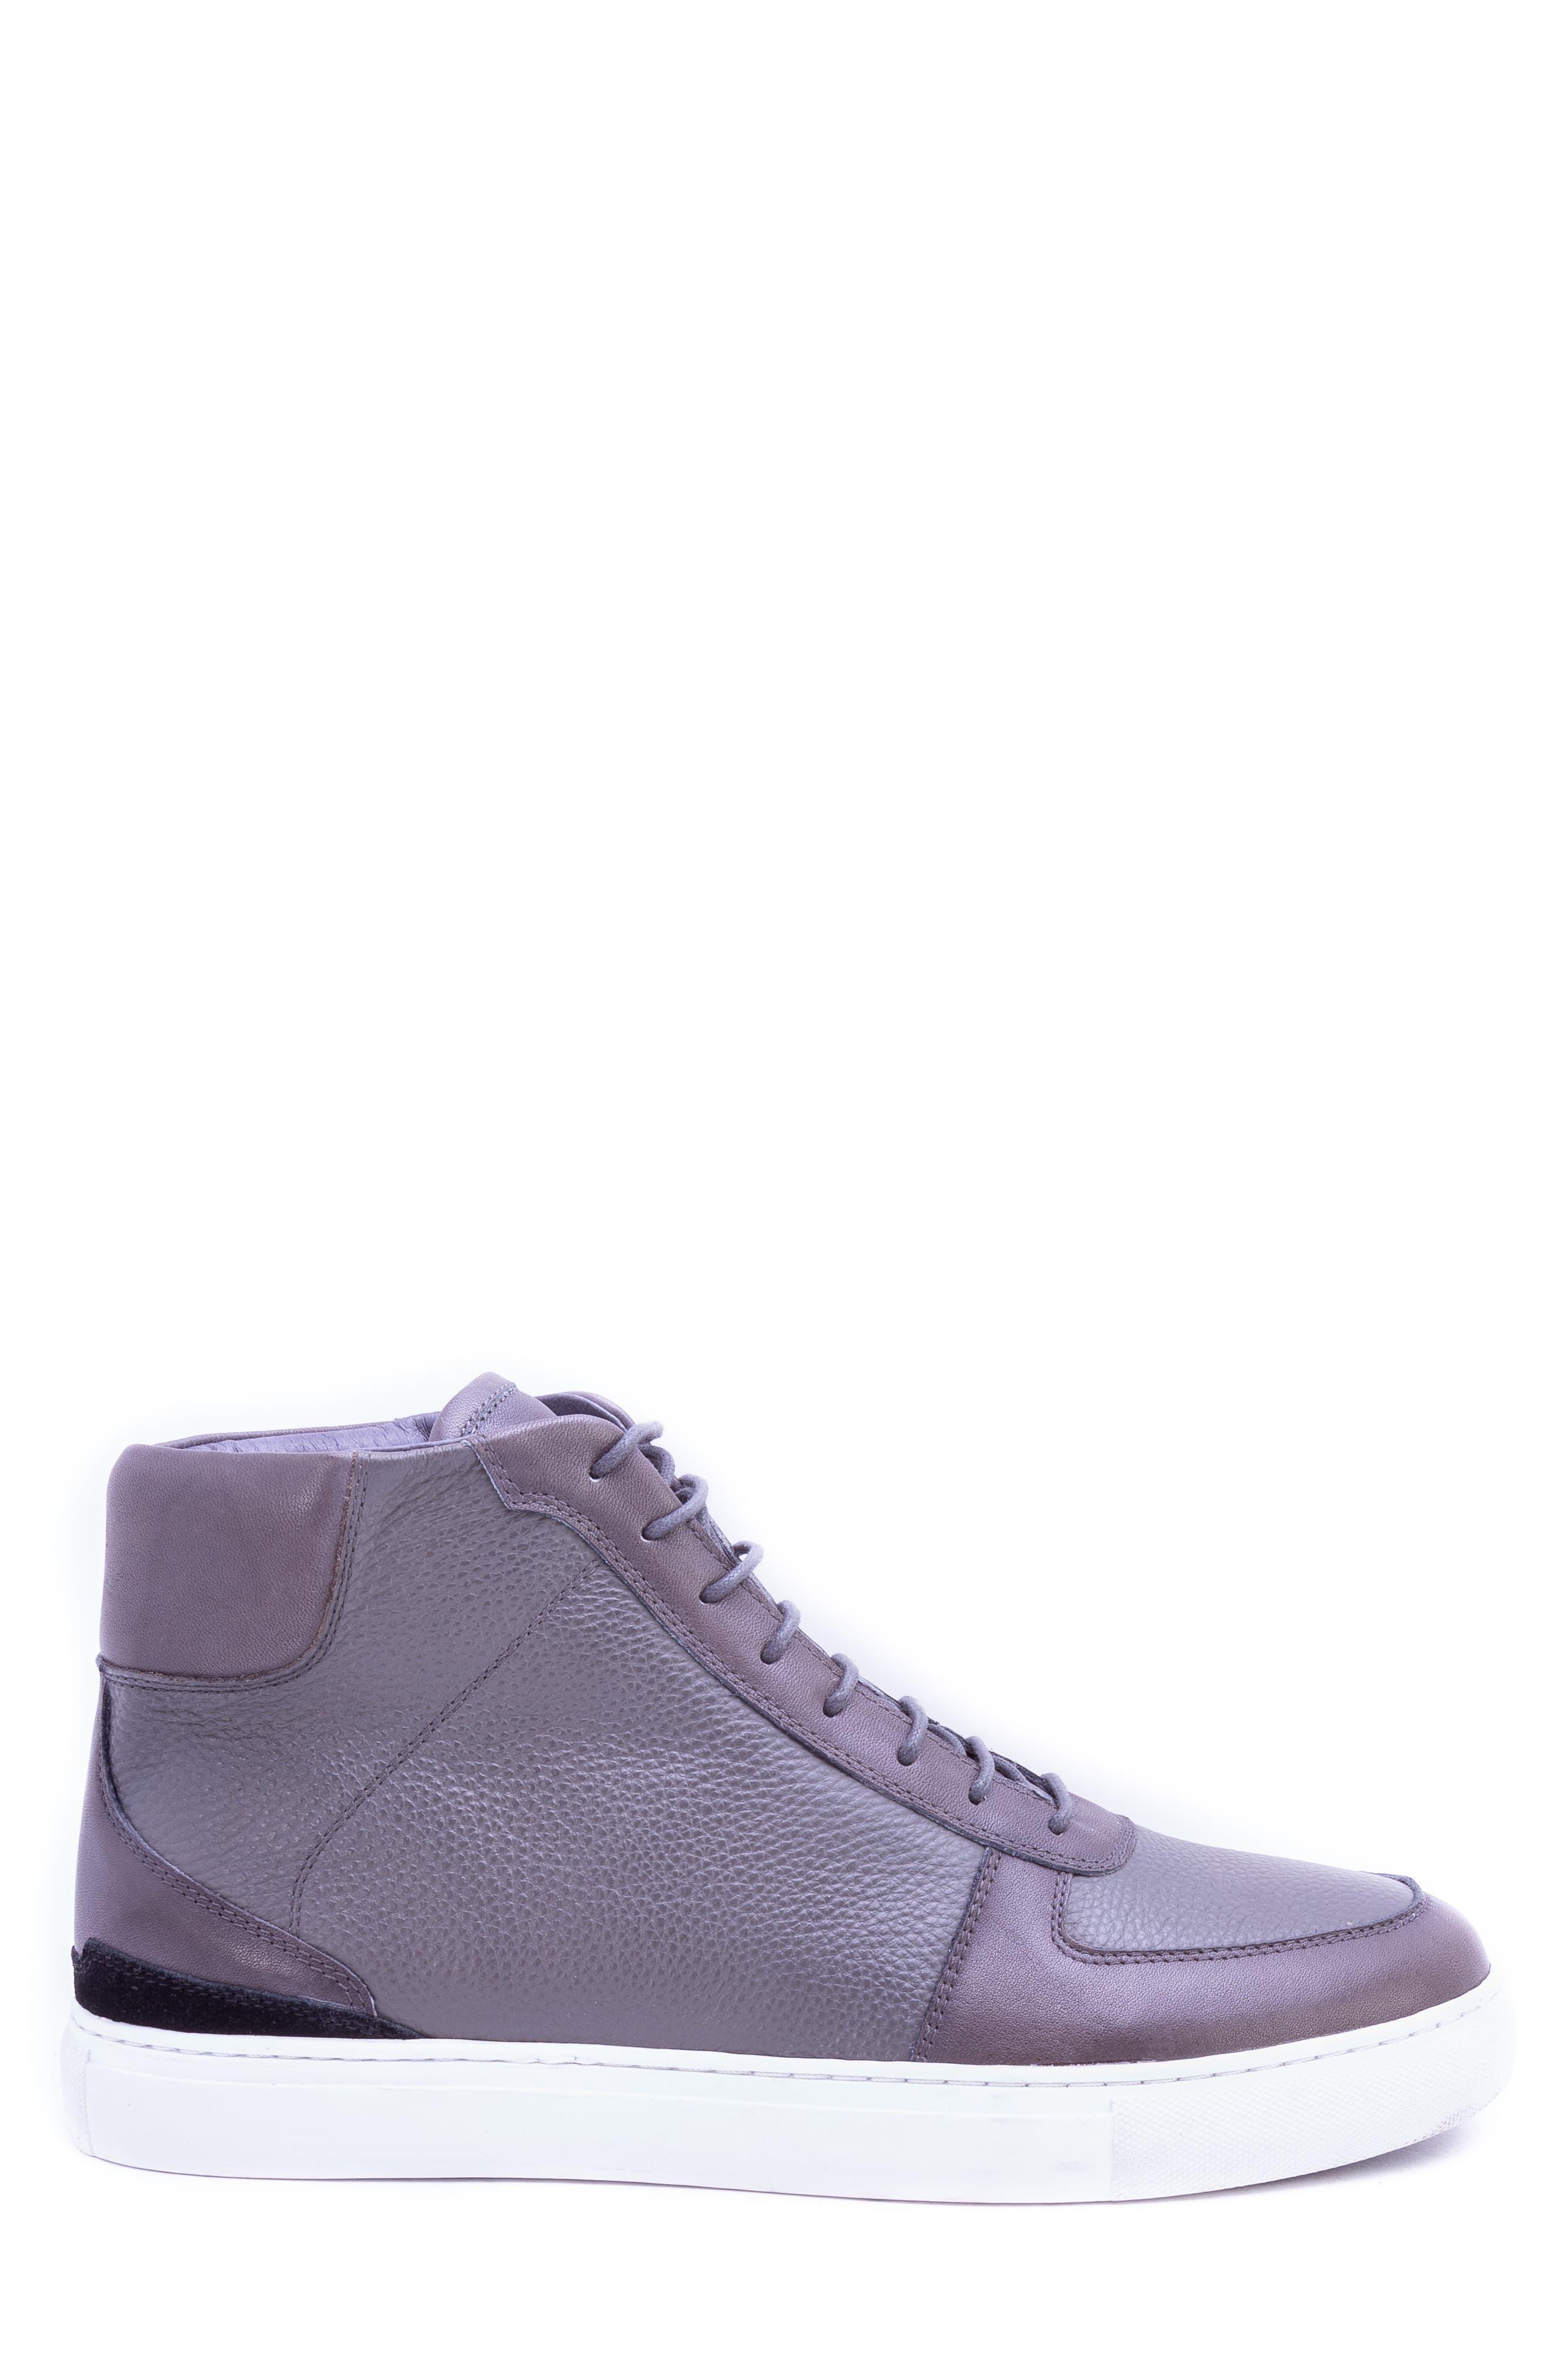 Tassel High Top Sneaker,                             Alternate thumbnail 3, color,                             GREY LEATHER